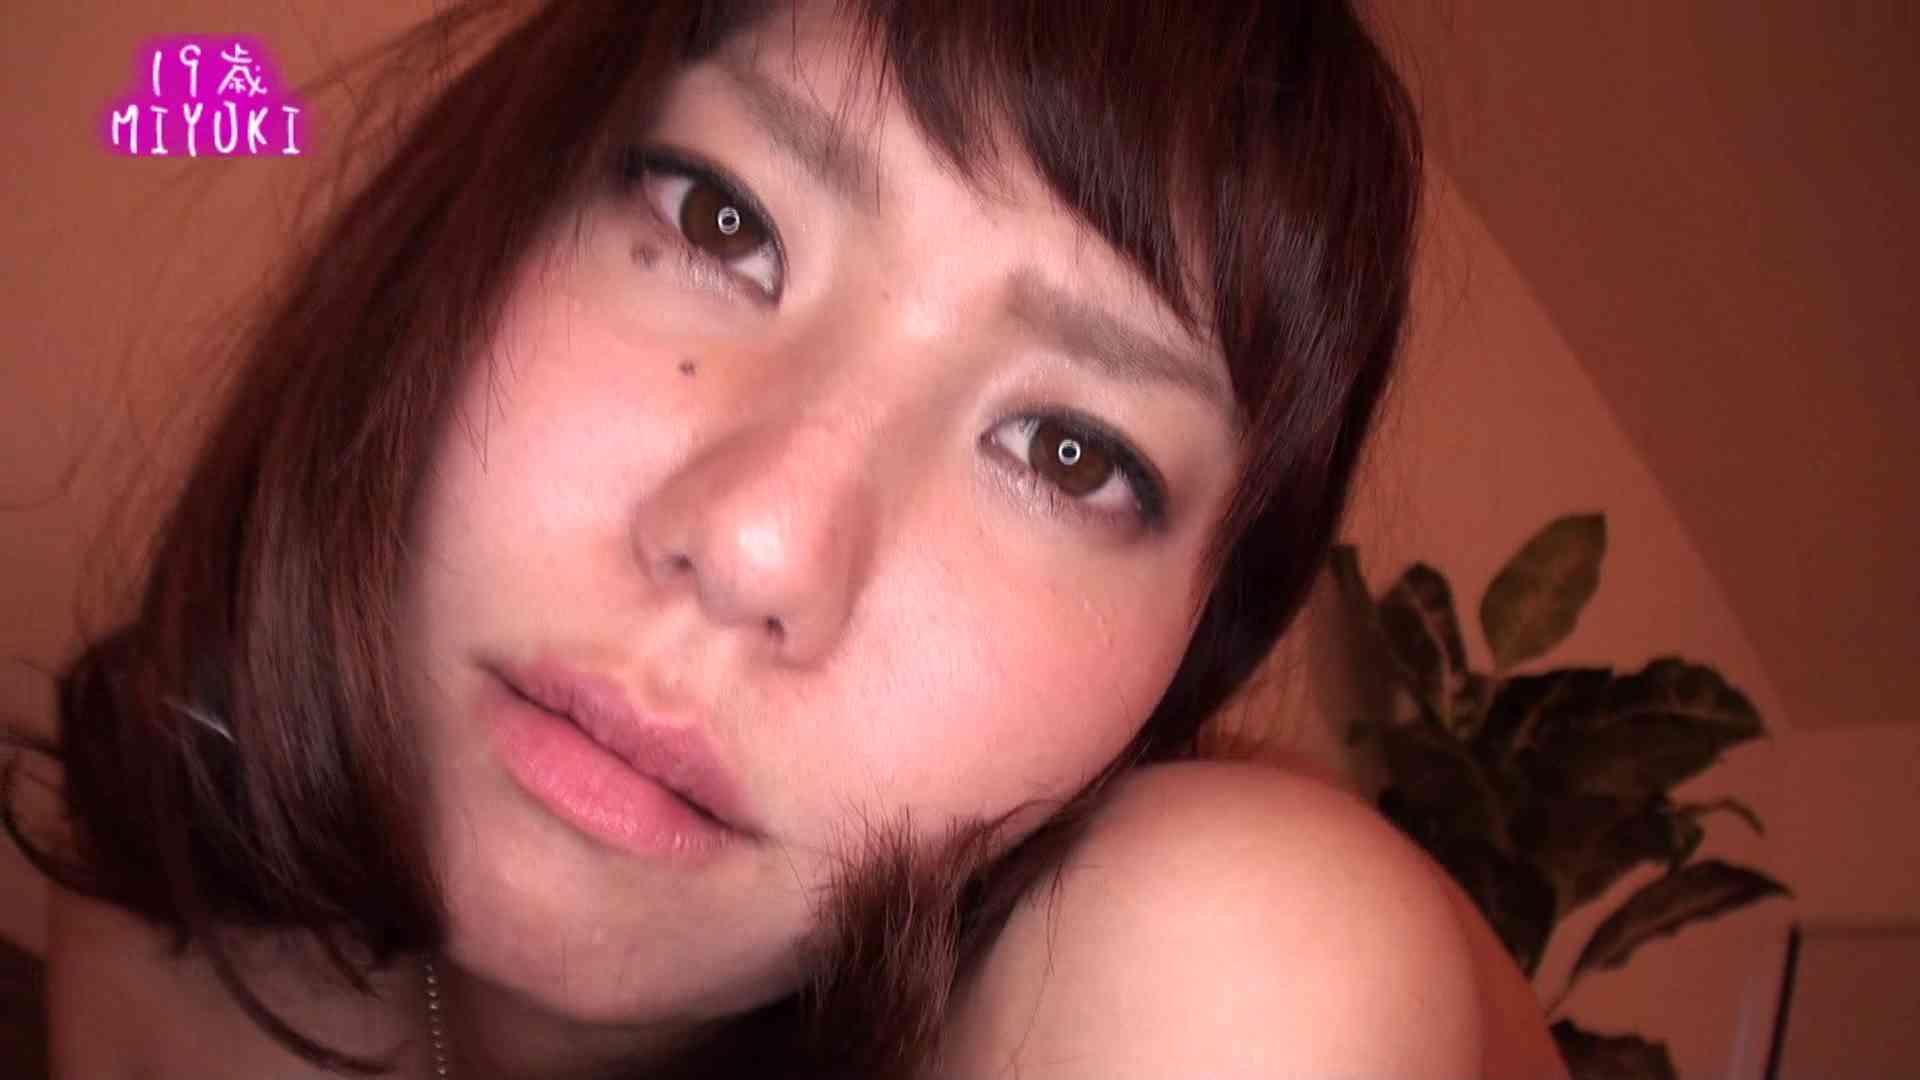 MIYUKIちゃん生挿入もう後戻りできません。 素人ハメ撮り   0  21pic 5